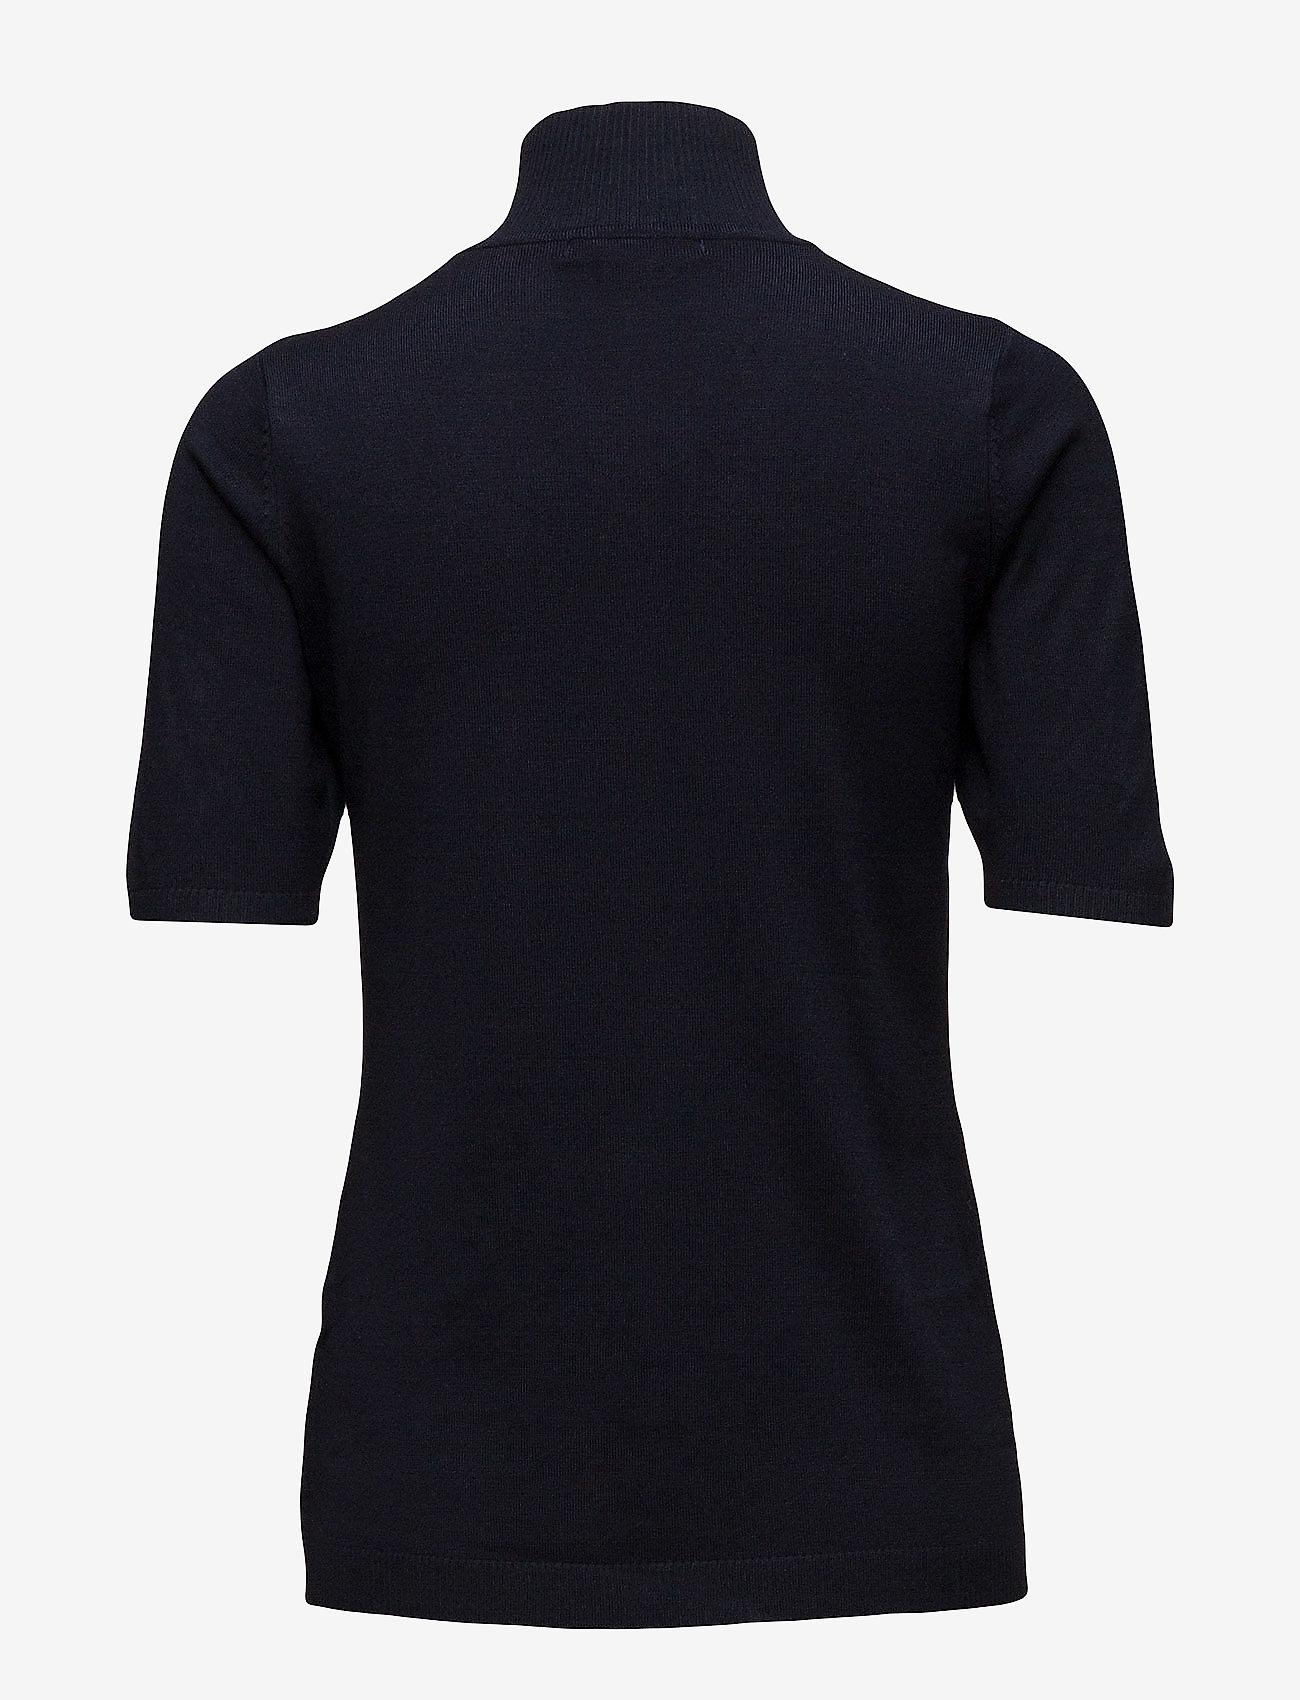 Minus - Lima roll neck knit - strikkede toppe - black iris solid - 1